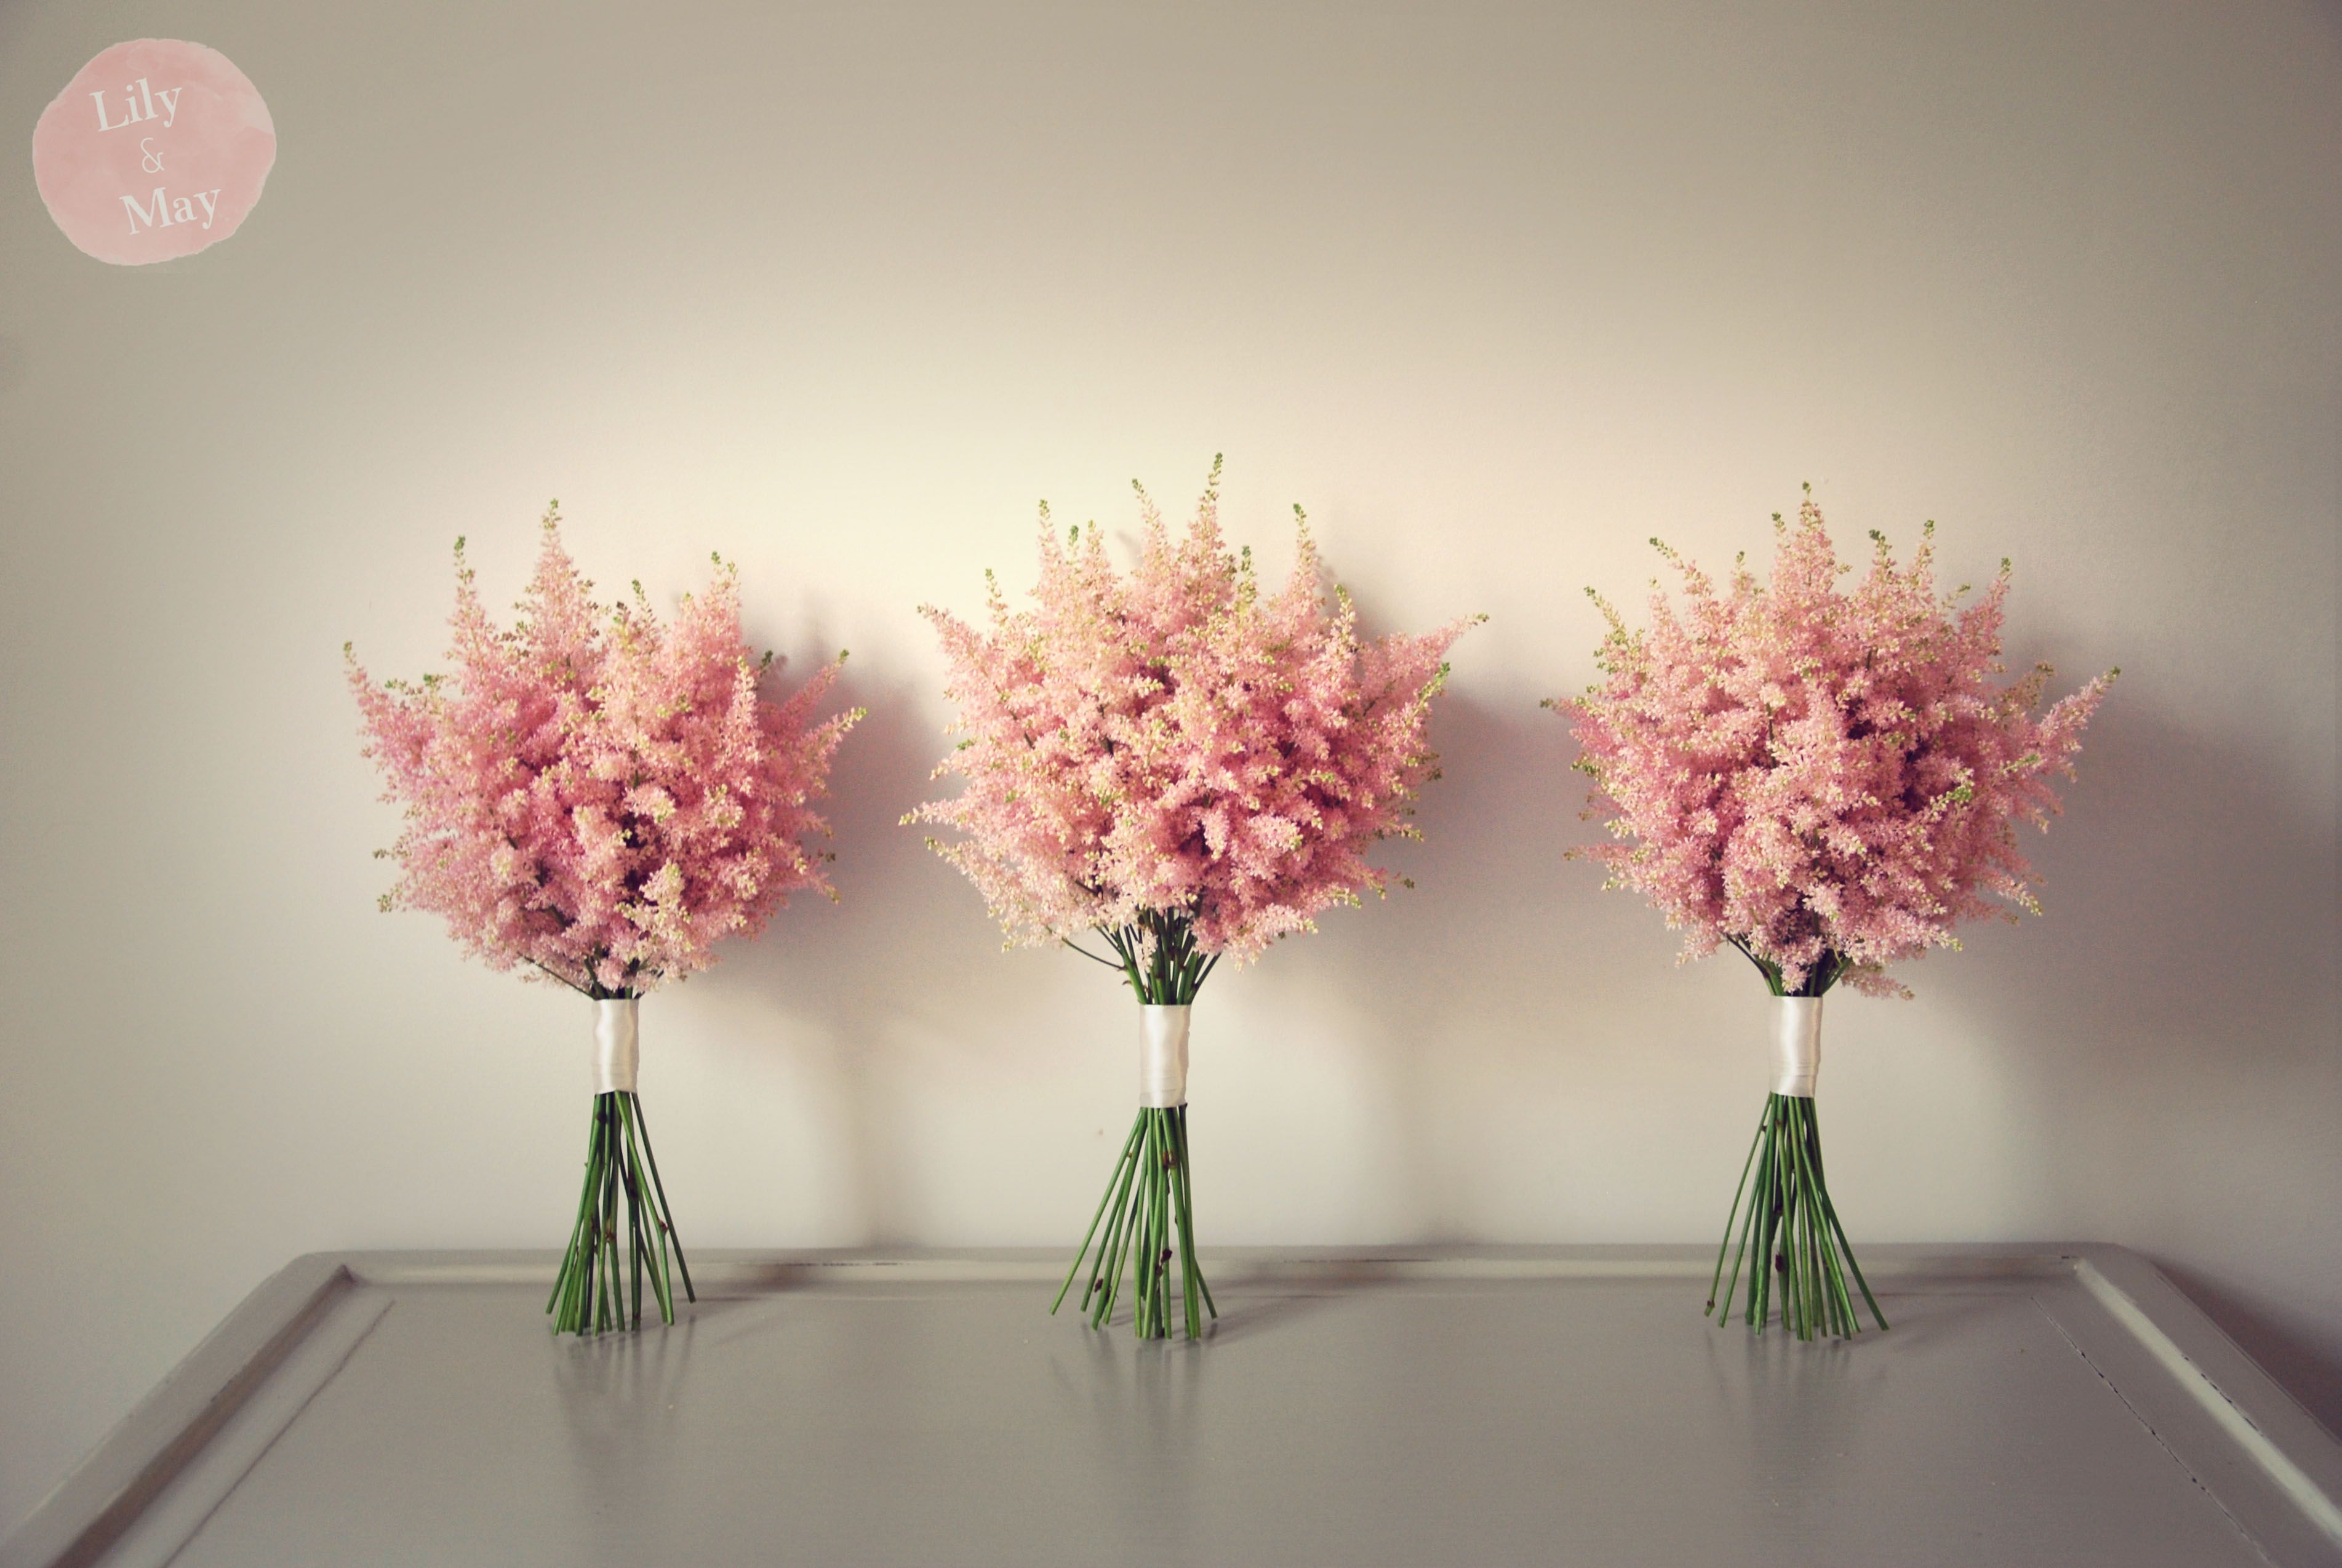 Lily & May Wedding Flowers Www.lilyandmay.co.uk